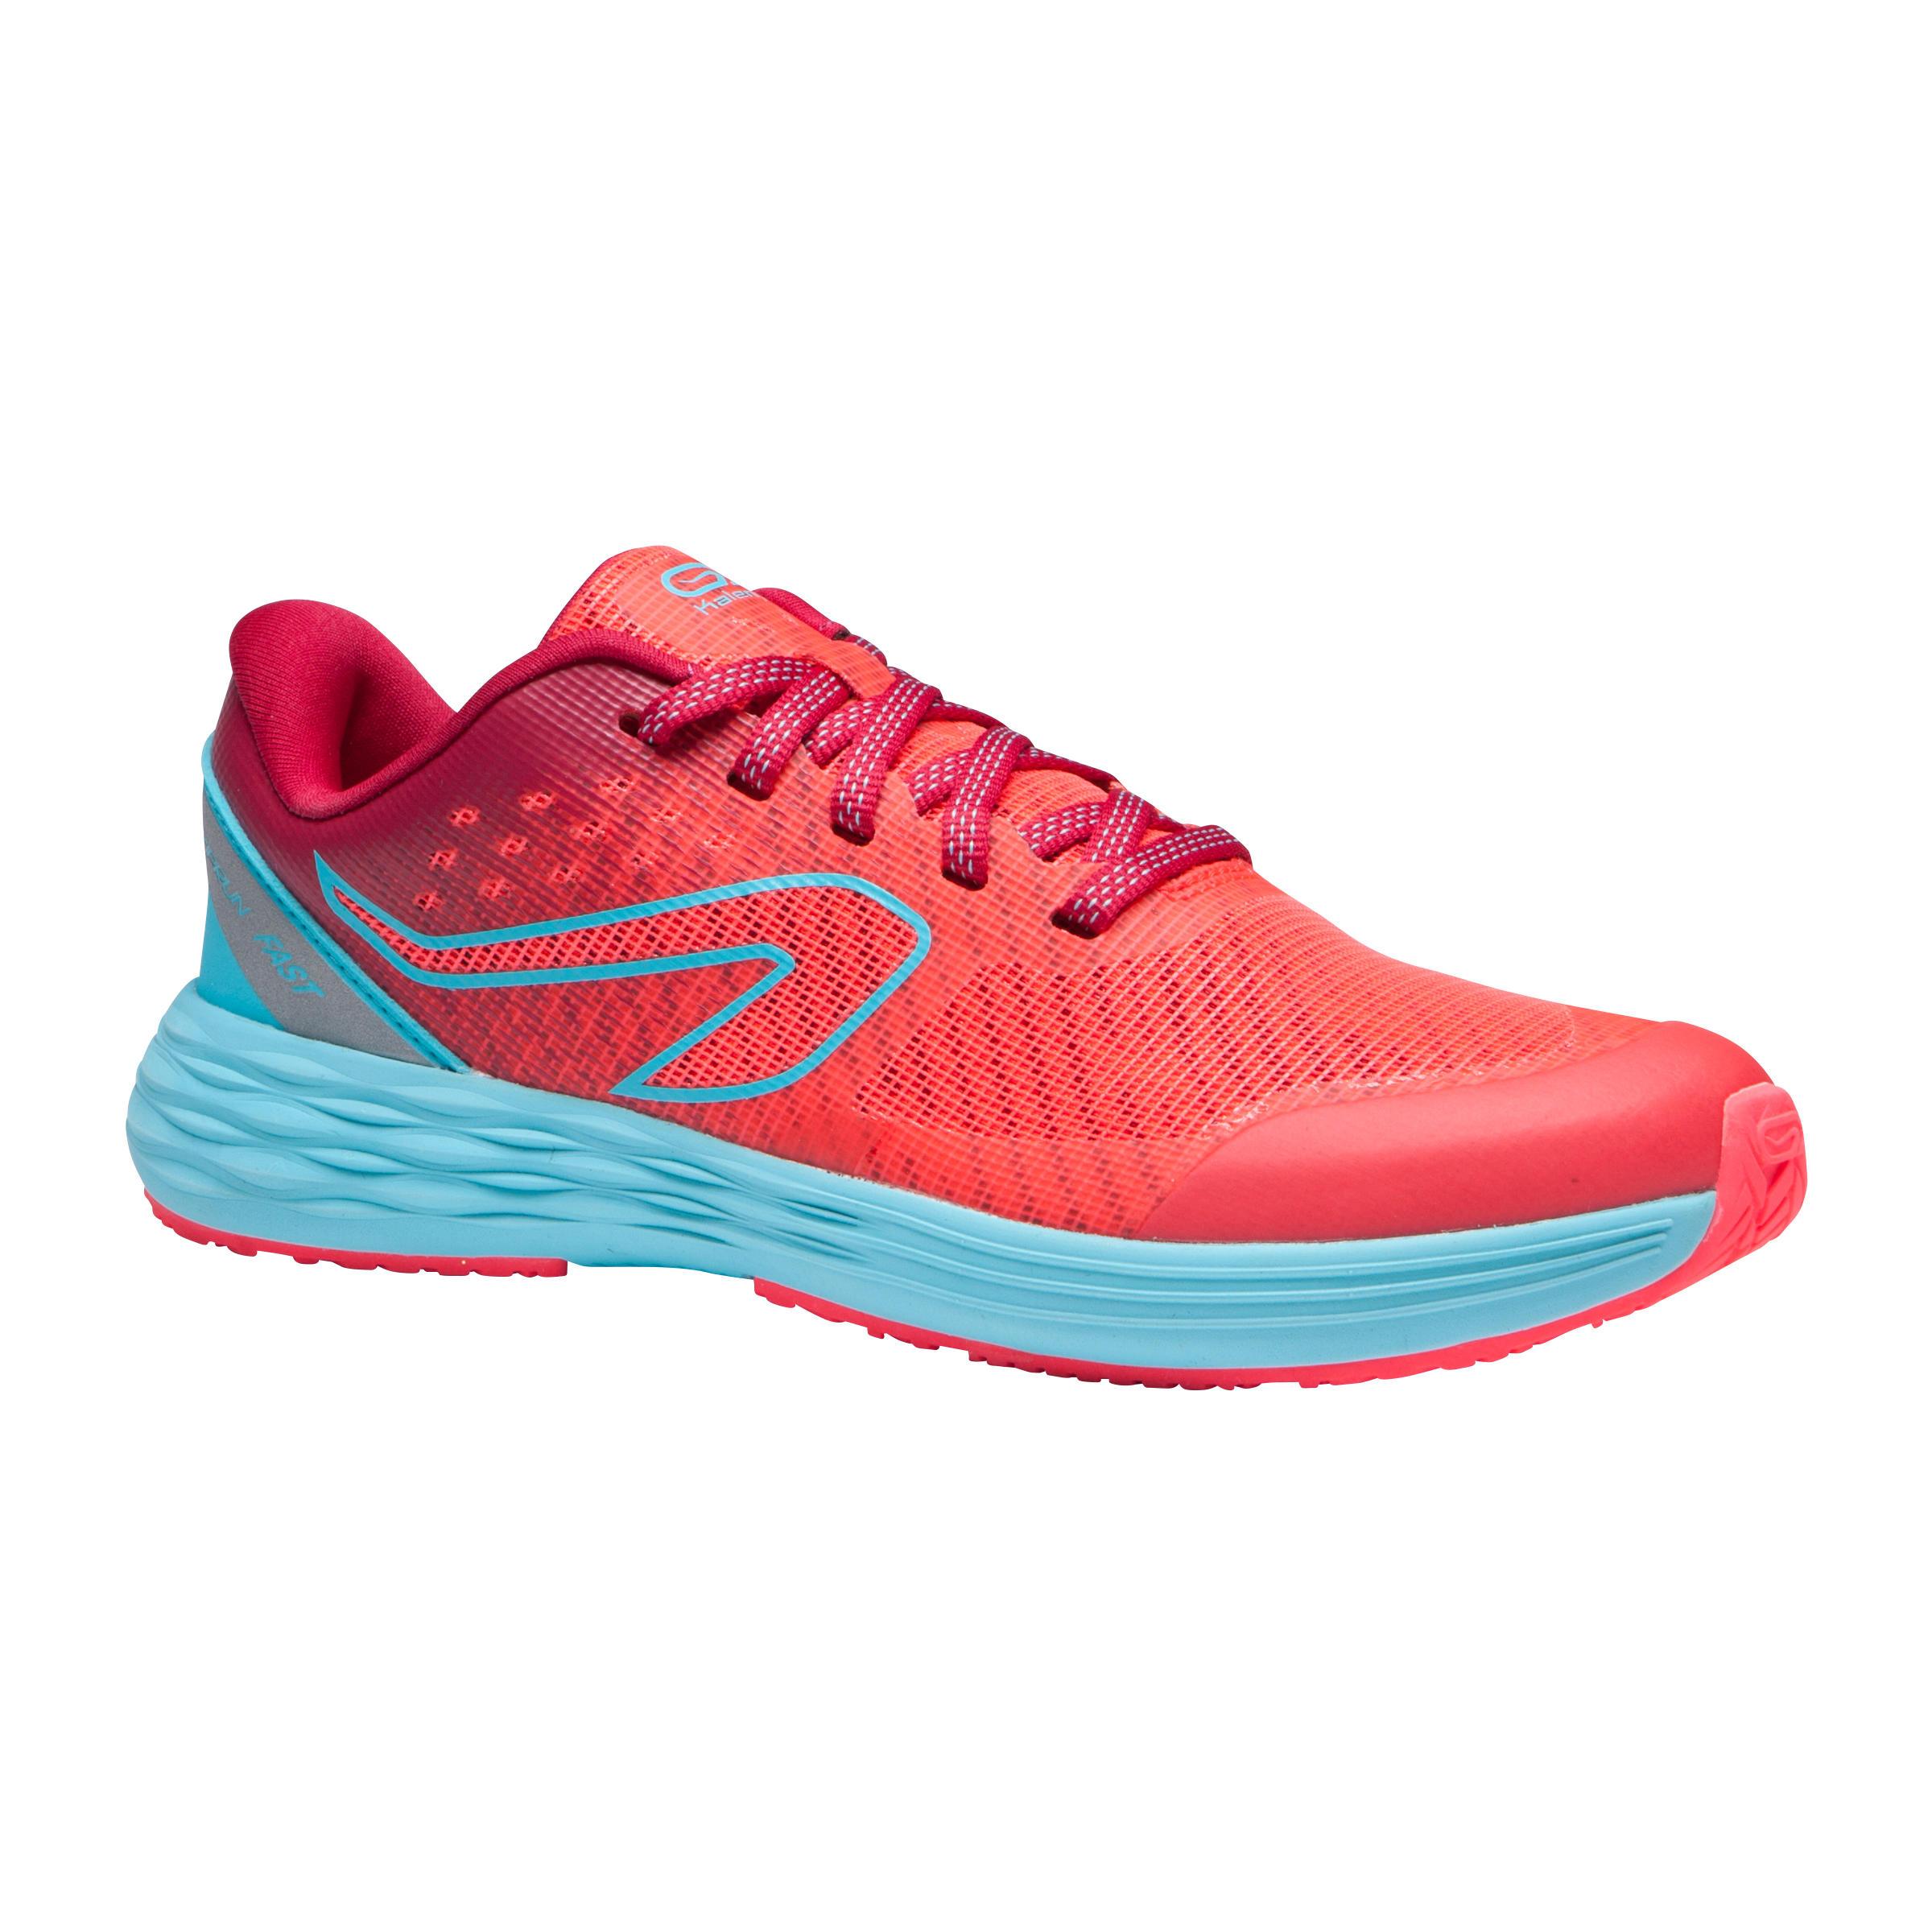 Espadrilles athlétisme enfant Kiprun Rose Turquoise